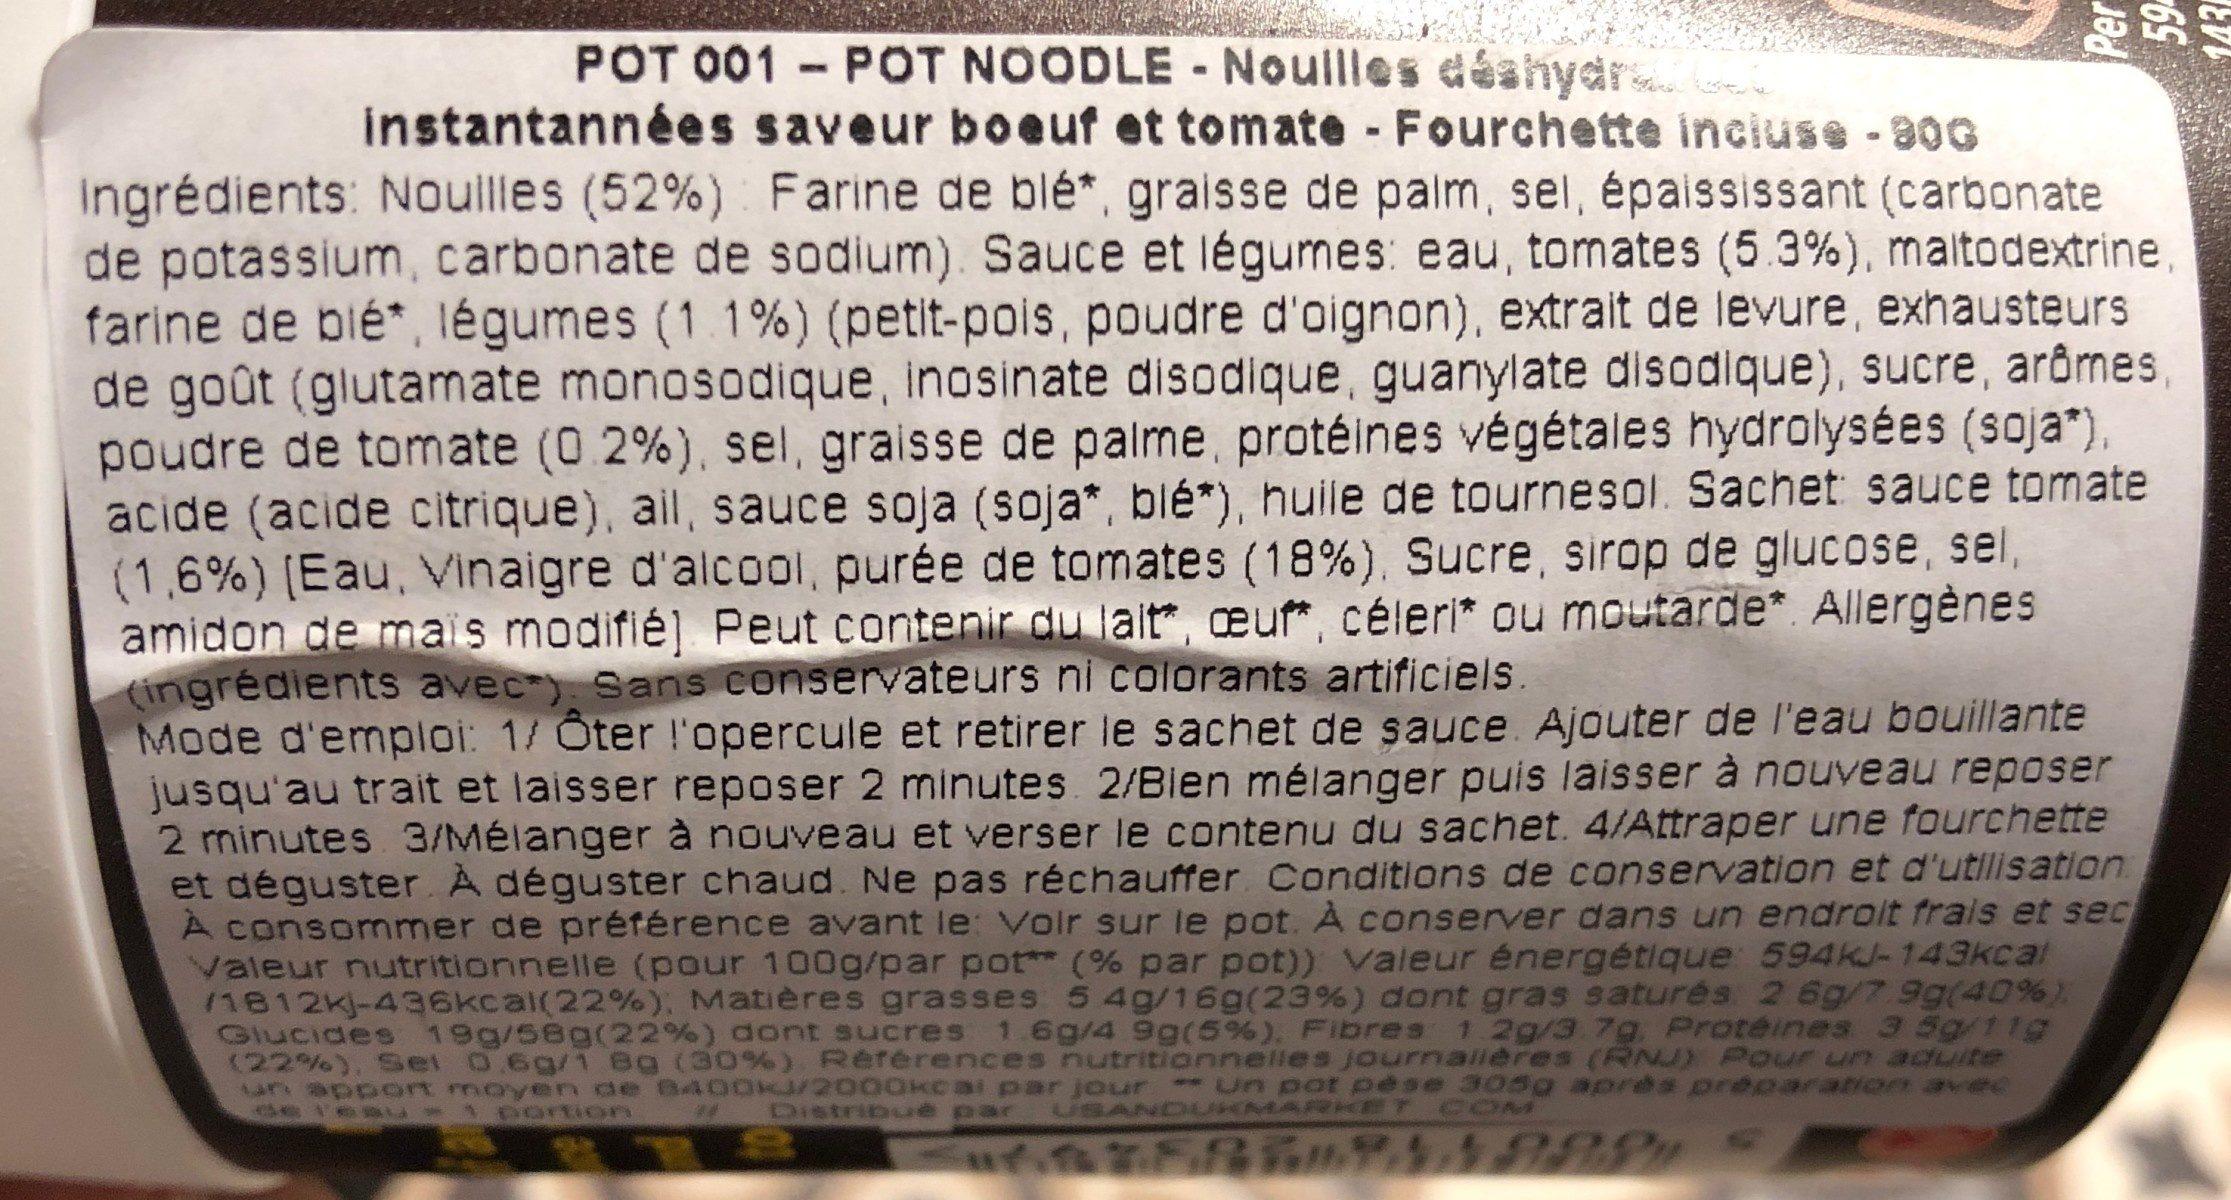 Pot Noodle Beef And Tomato - Ingrédients